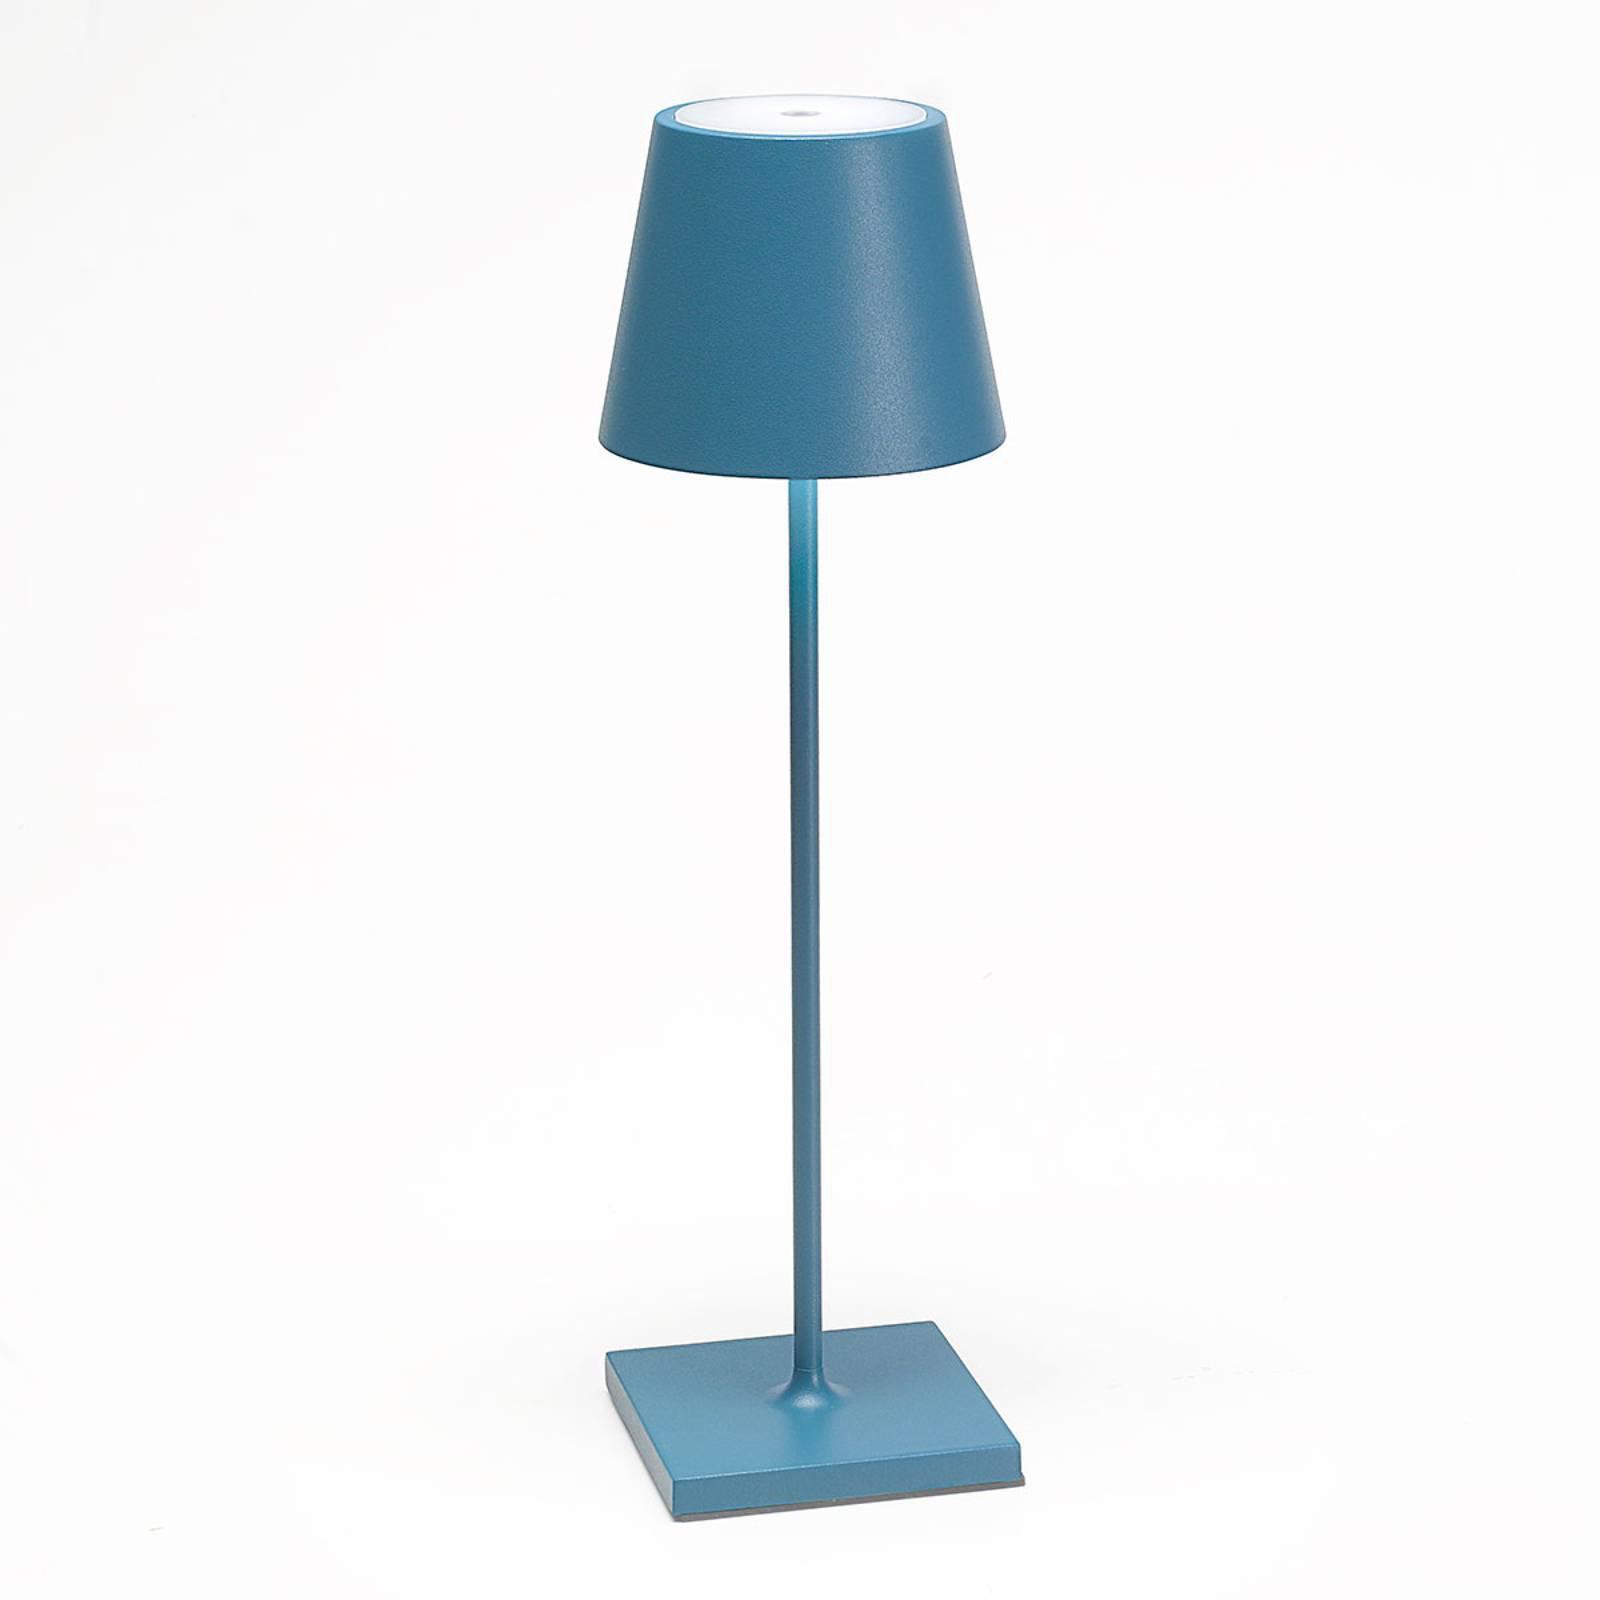 LED-bordlampe Poldina med batteri, bærbar, blå